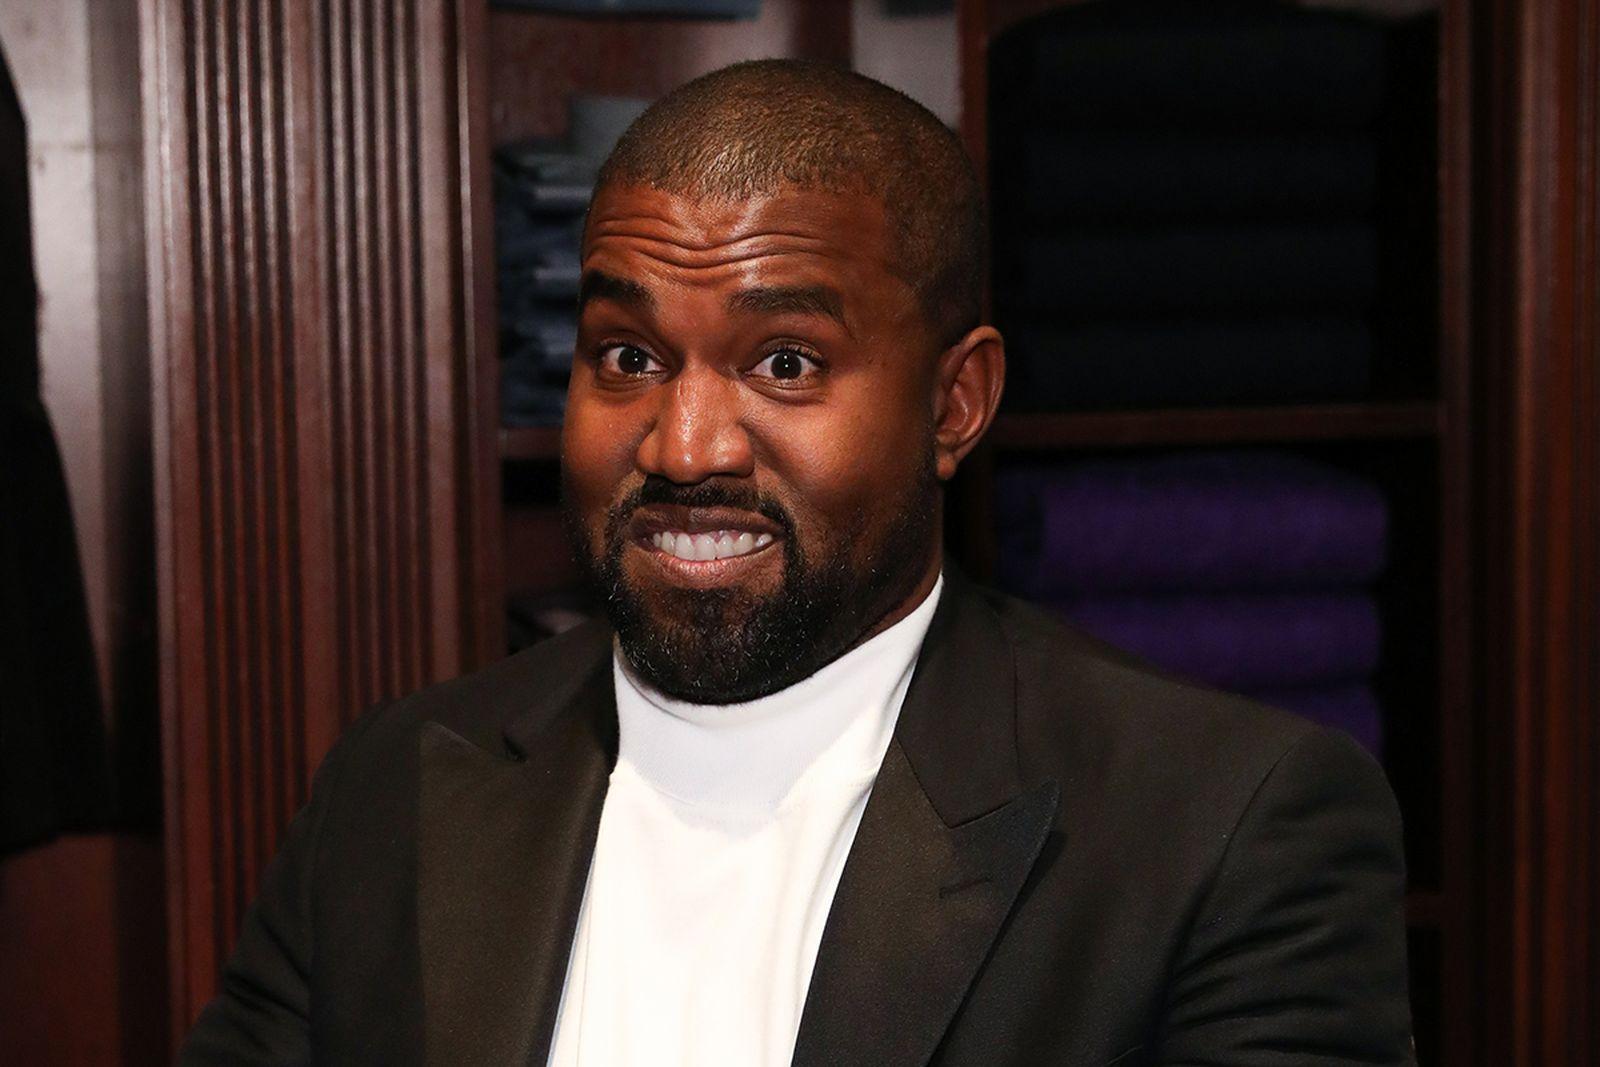 Kanye West speaking